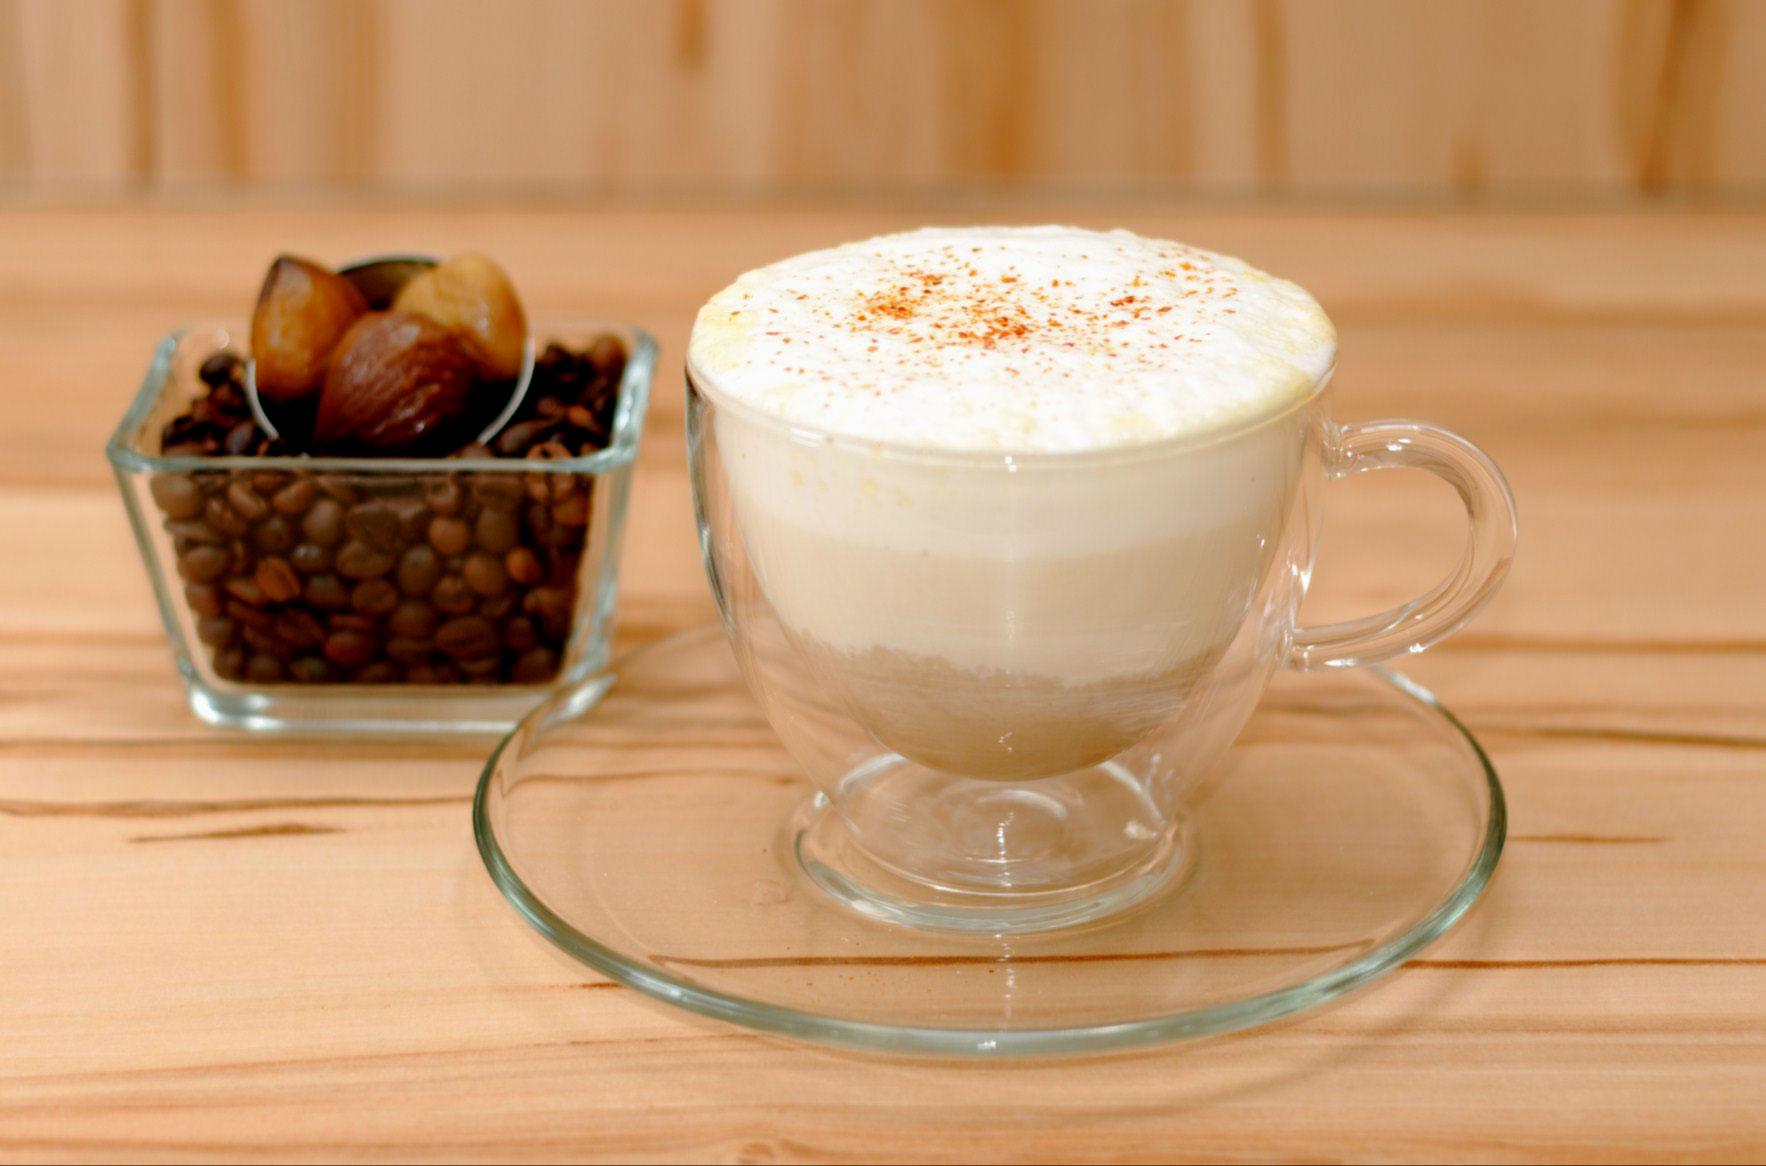 Maronencappuccino